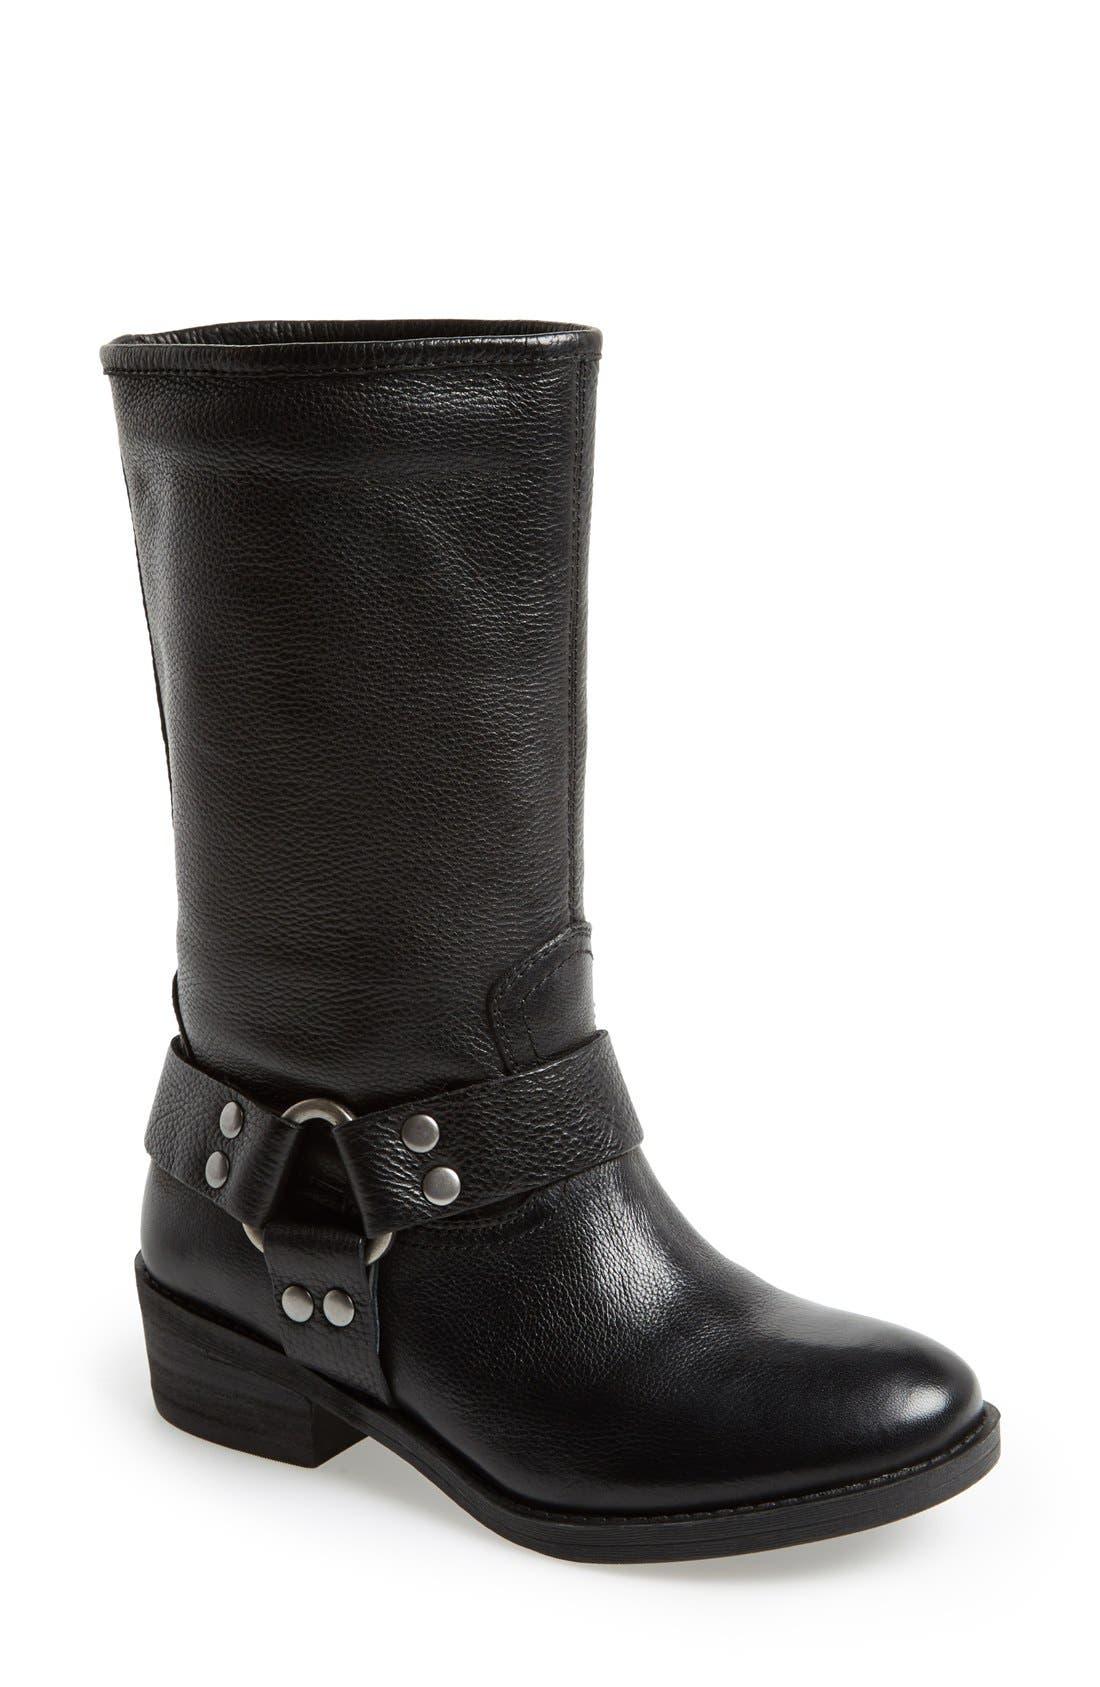 Main Image - Lucky Brand 'Rolanda' Leather Harness Boot (Women)